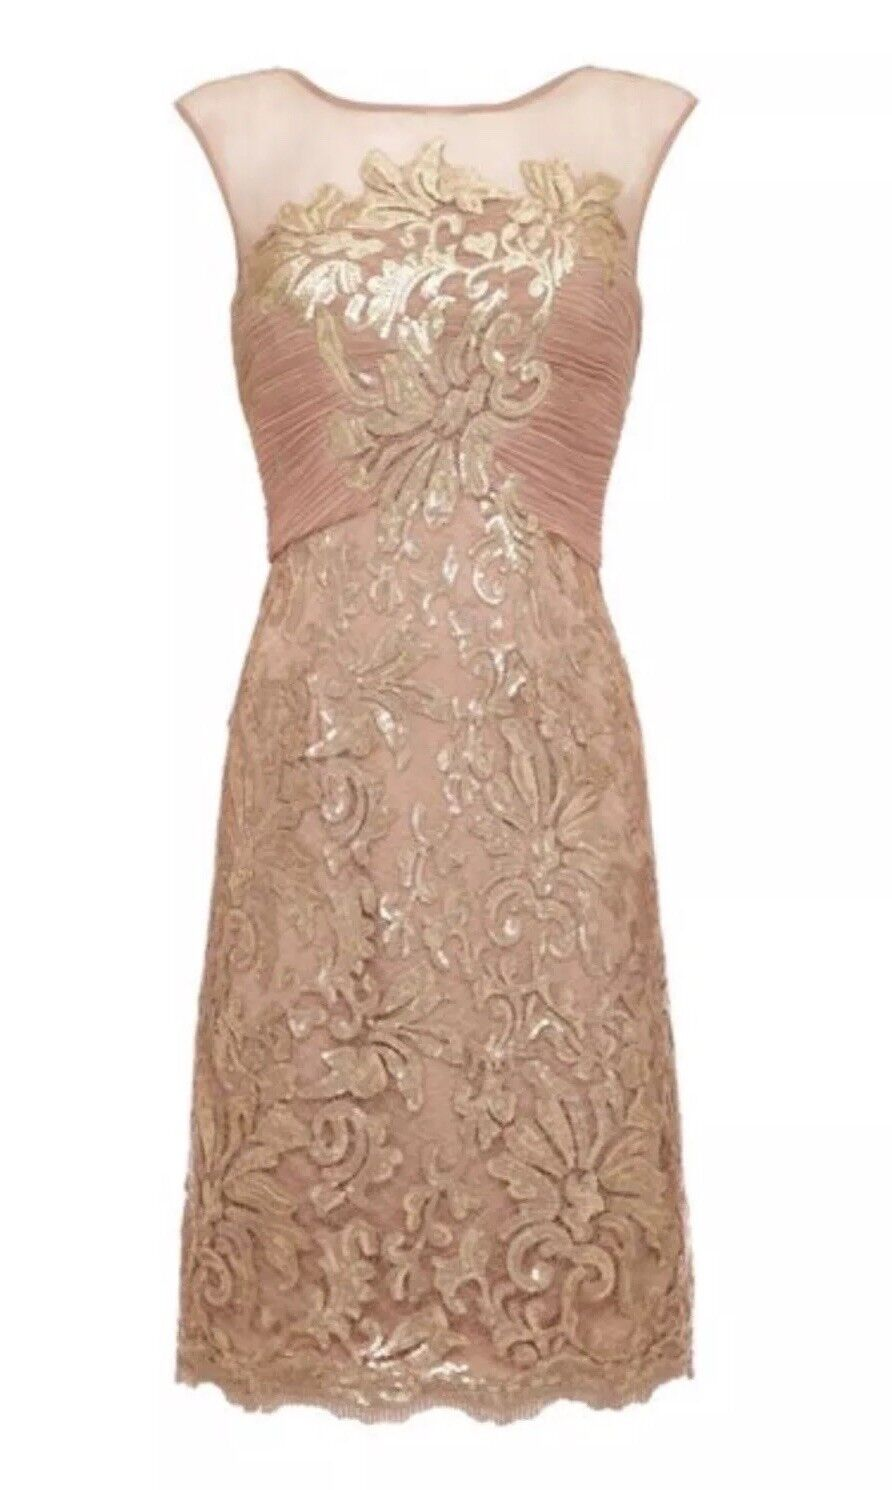 BERNSHAW Bridget Dress  Women Occasion Sequinned Design Sizes  8 & 12